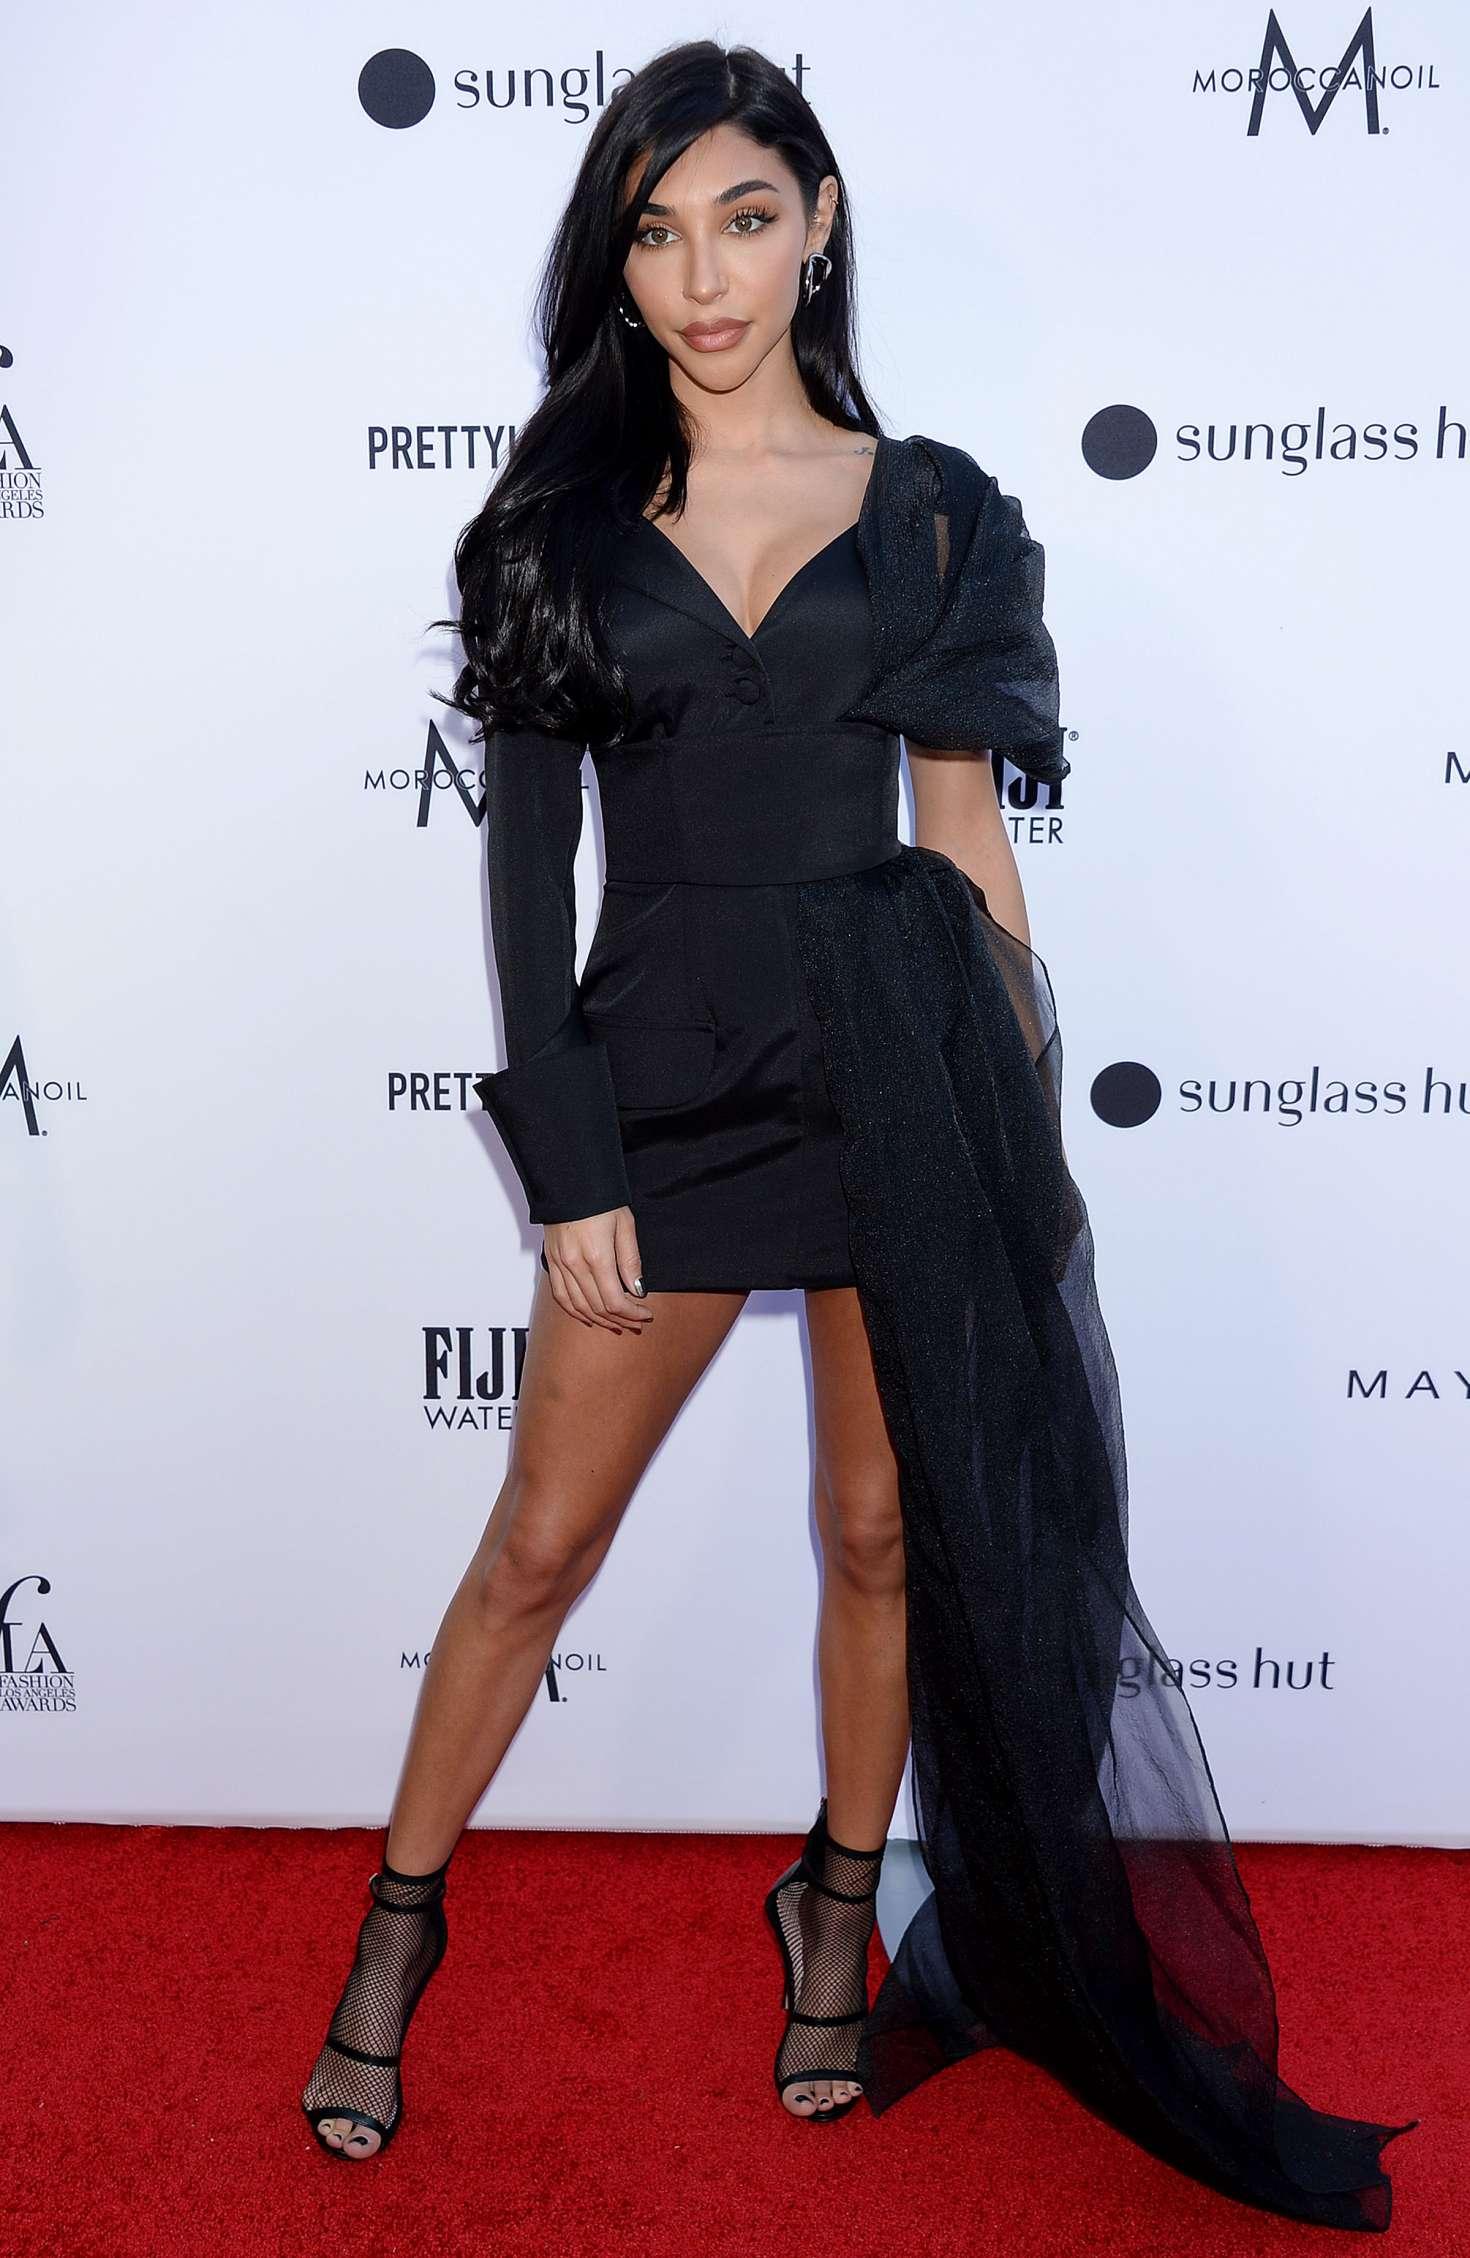 Chantel Jeffries 2019 : Chantel Jeffries: Daily Front Row Fashion Awards 2019 -09